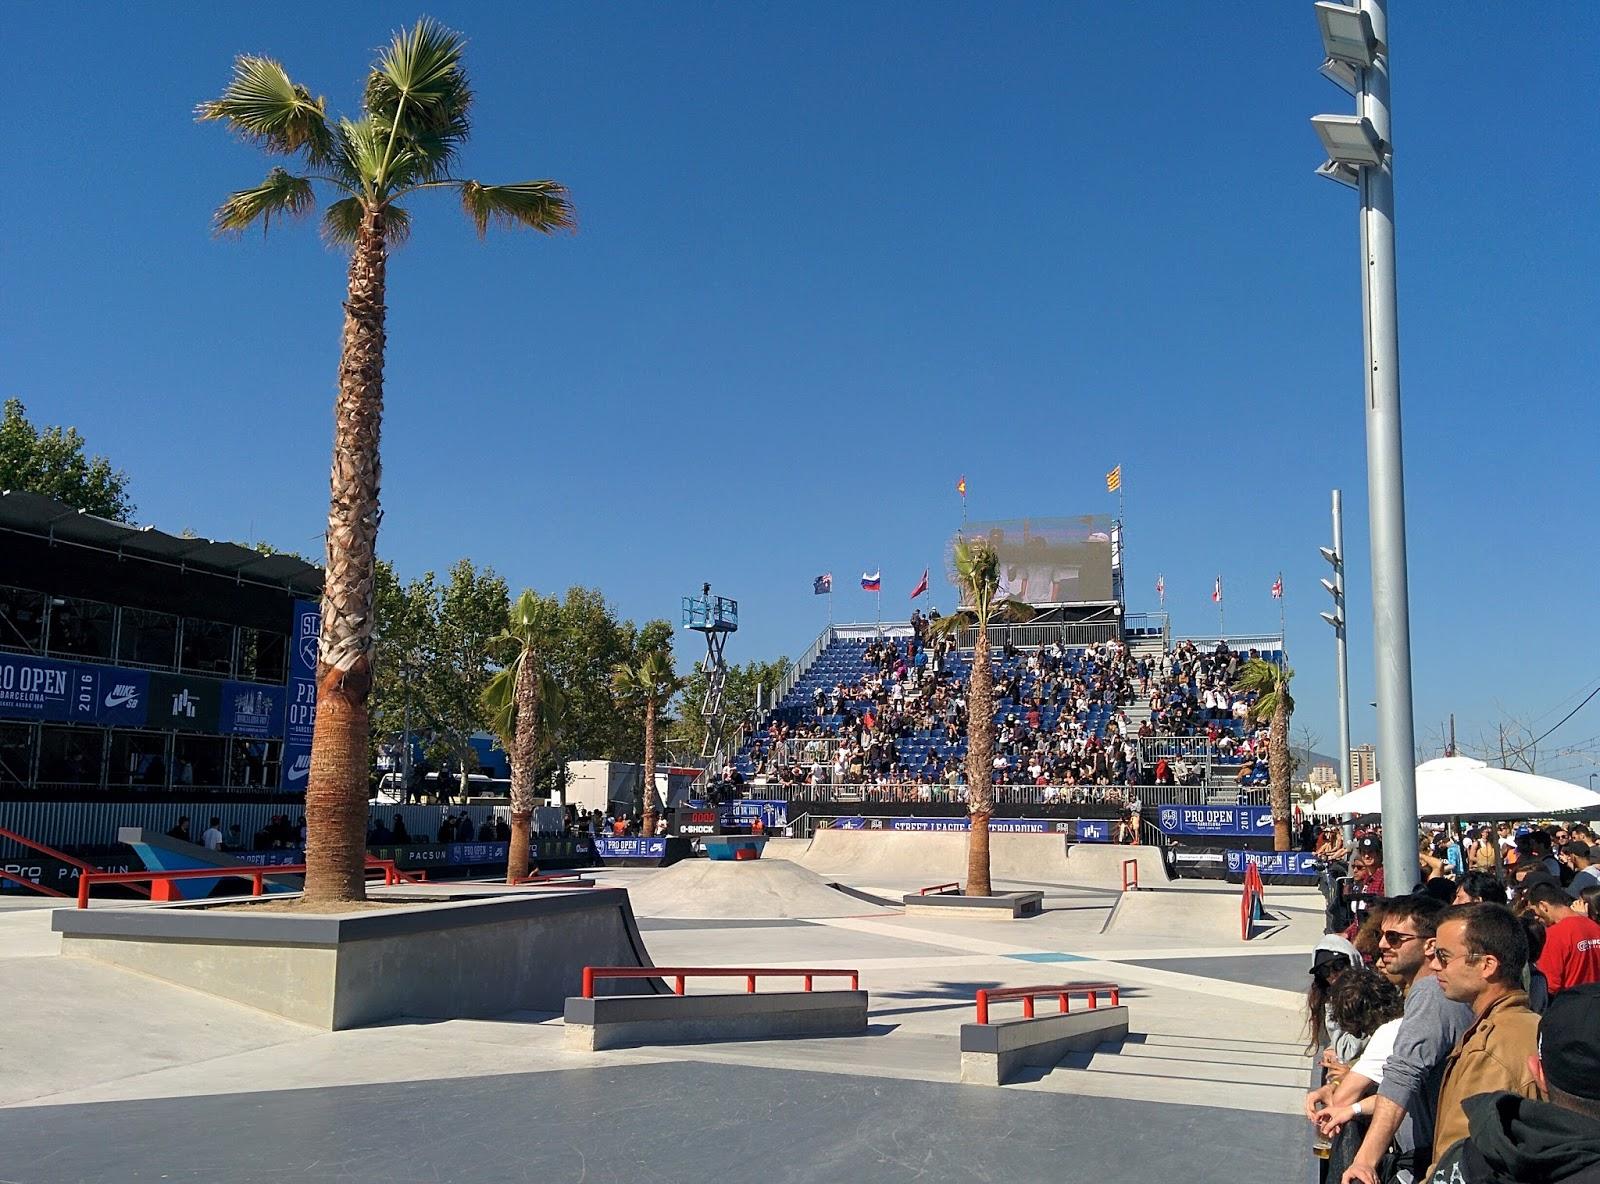 botella columpio jamón  Where Is Darren Now?: 2016 Nike Barcelona SLS Skateboard Contest